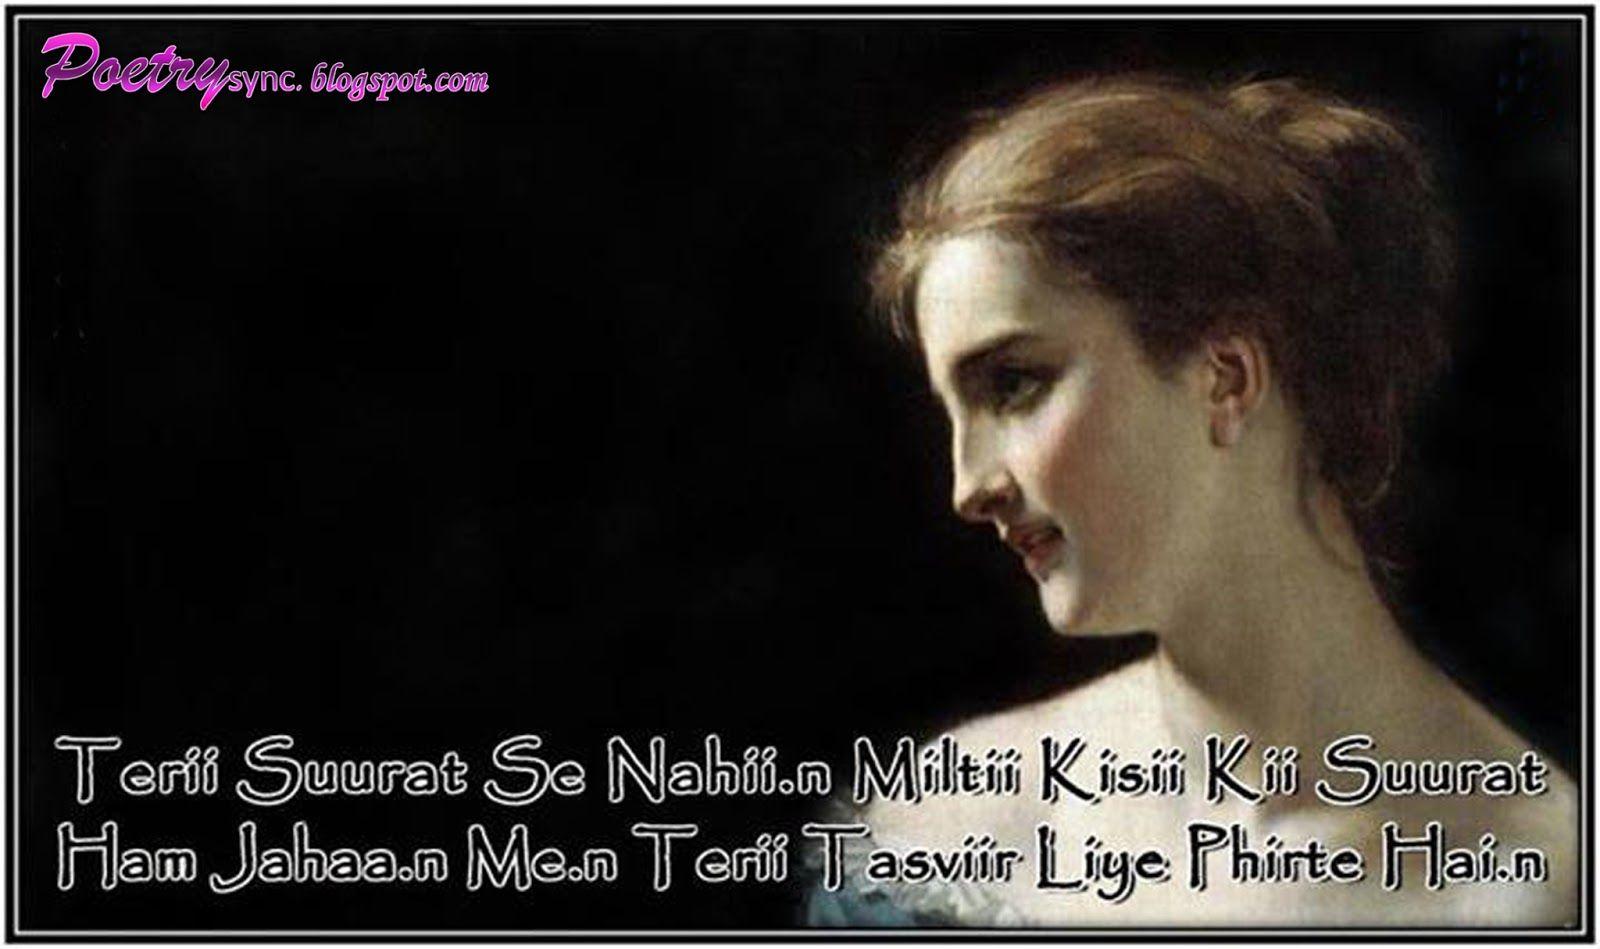 Love Sad Shayari English: Sad Love Quotes For Facebook Status In English 7WKmN3uex